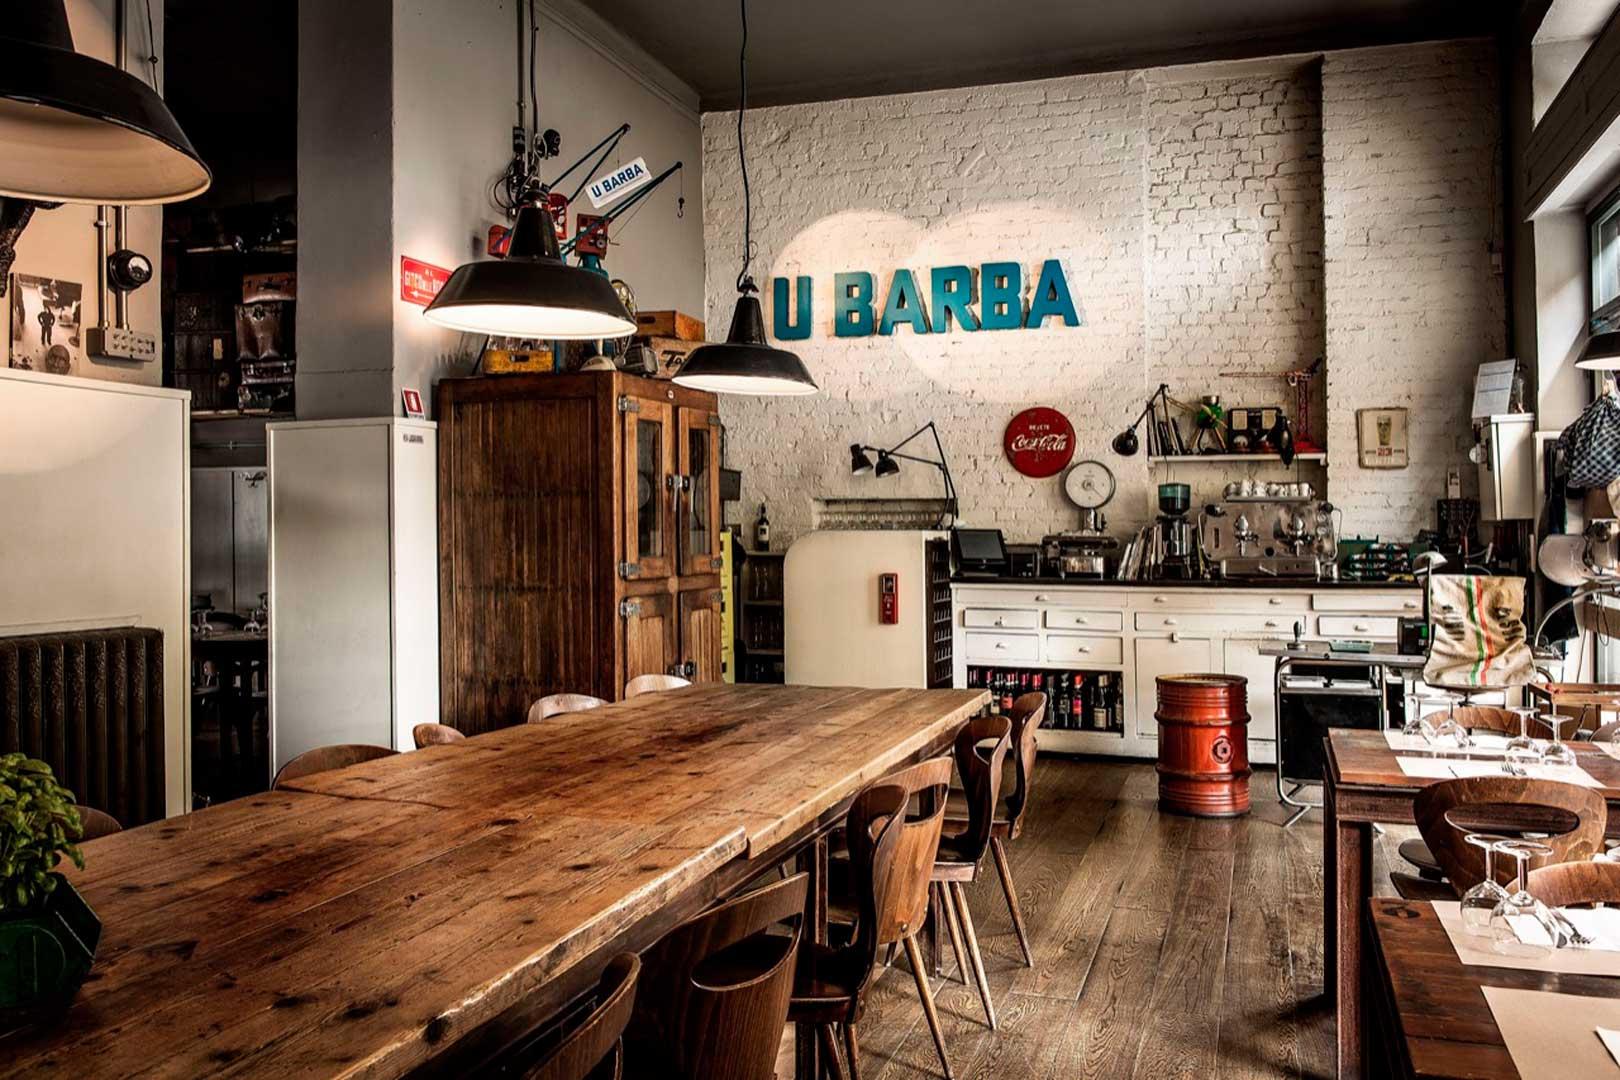 10 ristoranti industrial chic - U Barba